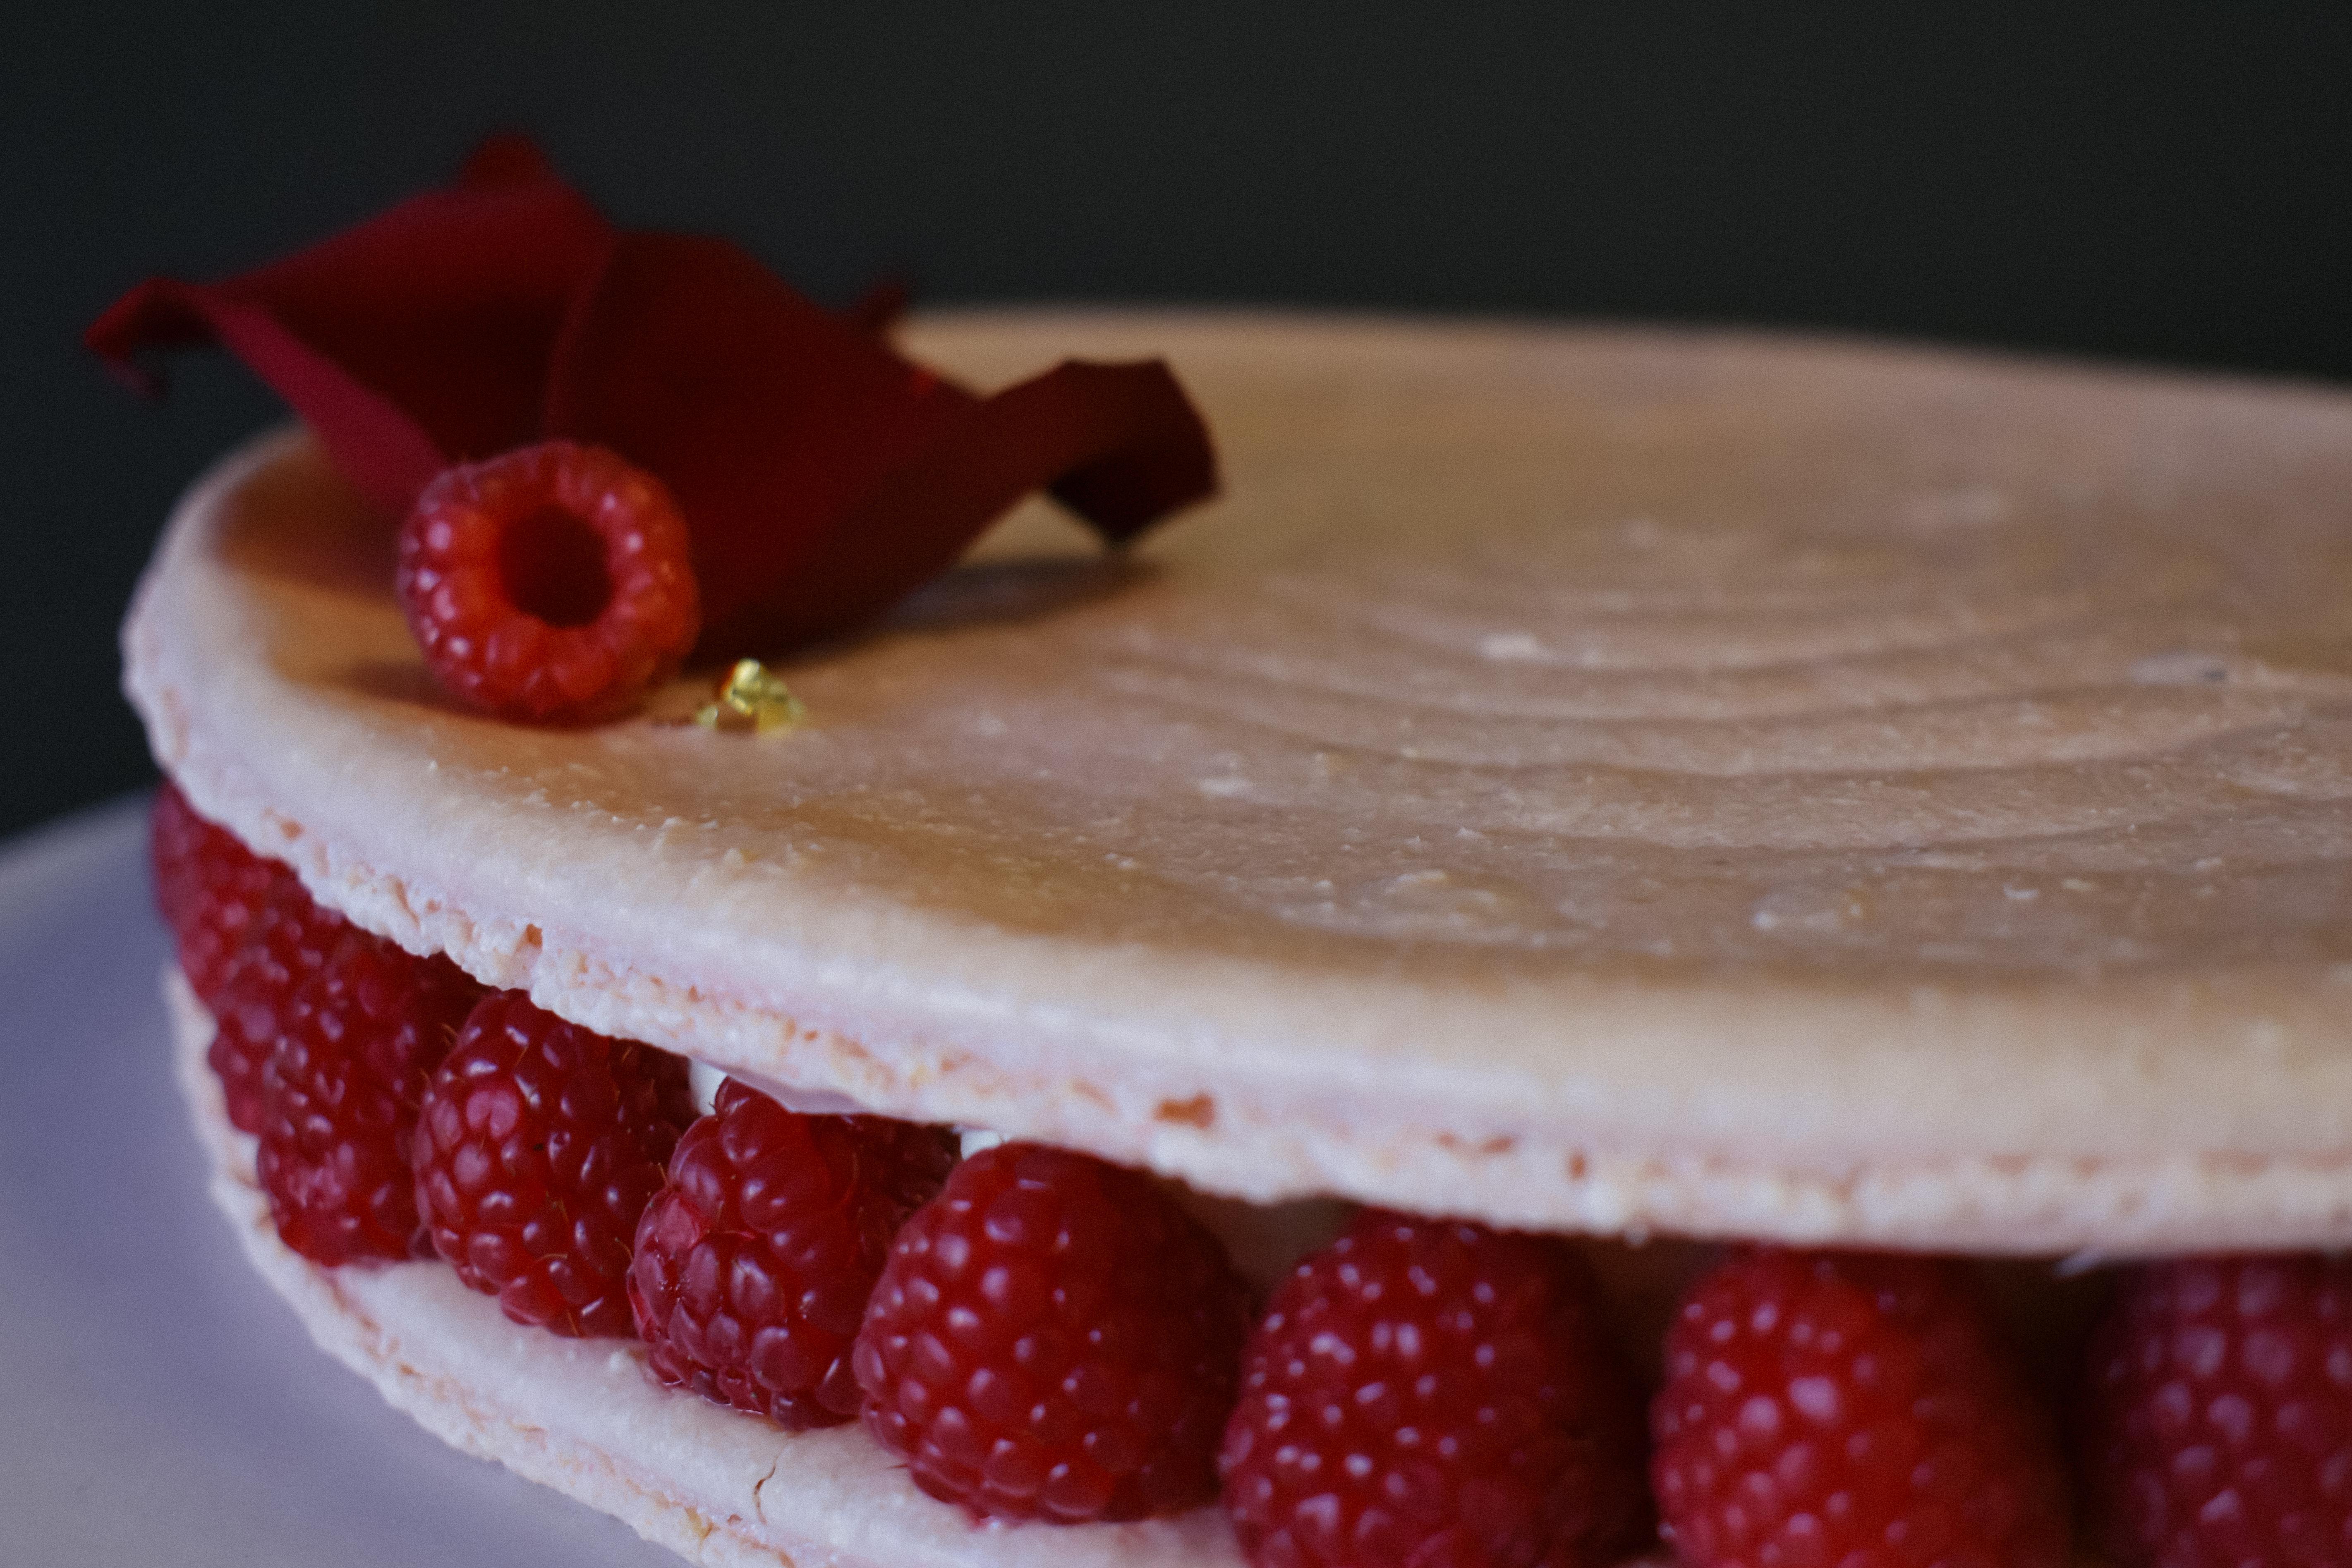 Raspberry Vanilla Macaron Cake Gluten Free for JL Patisserie high end bakery in Scottsdale